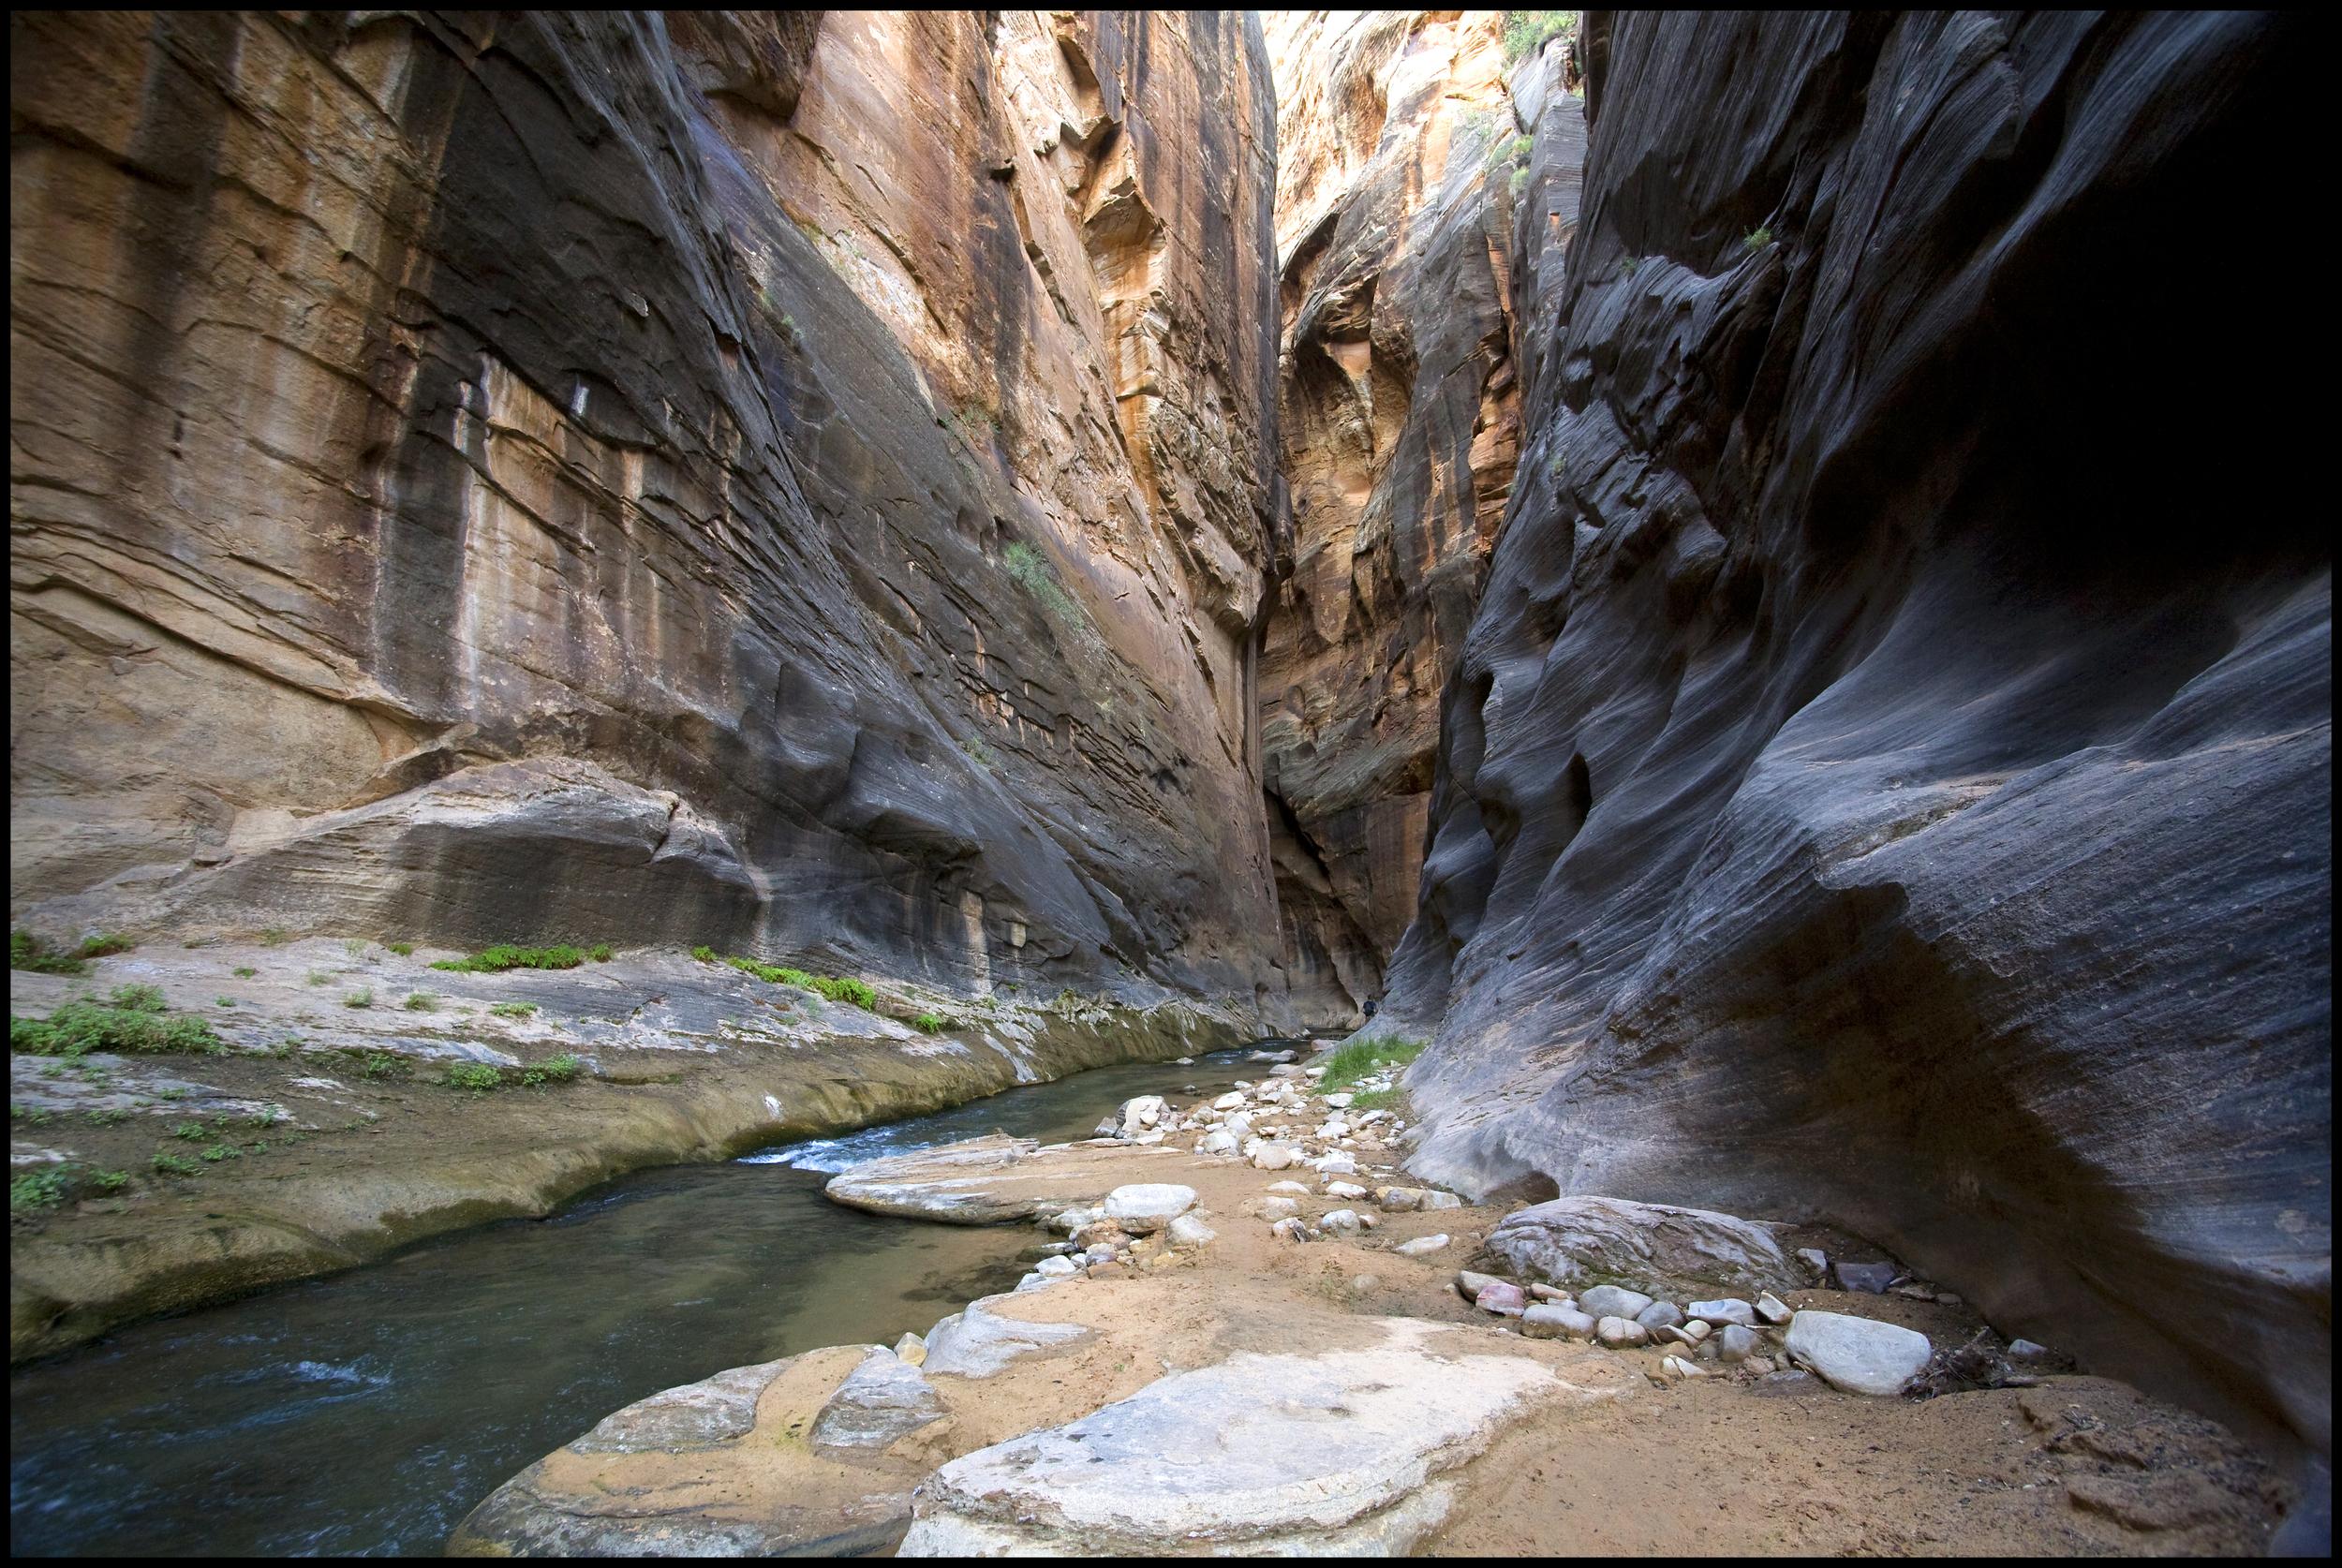 Parunuweap Canyon, UT